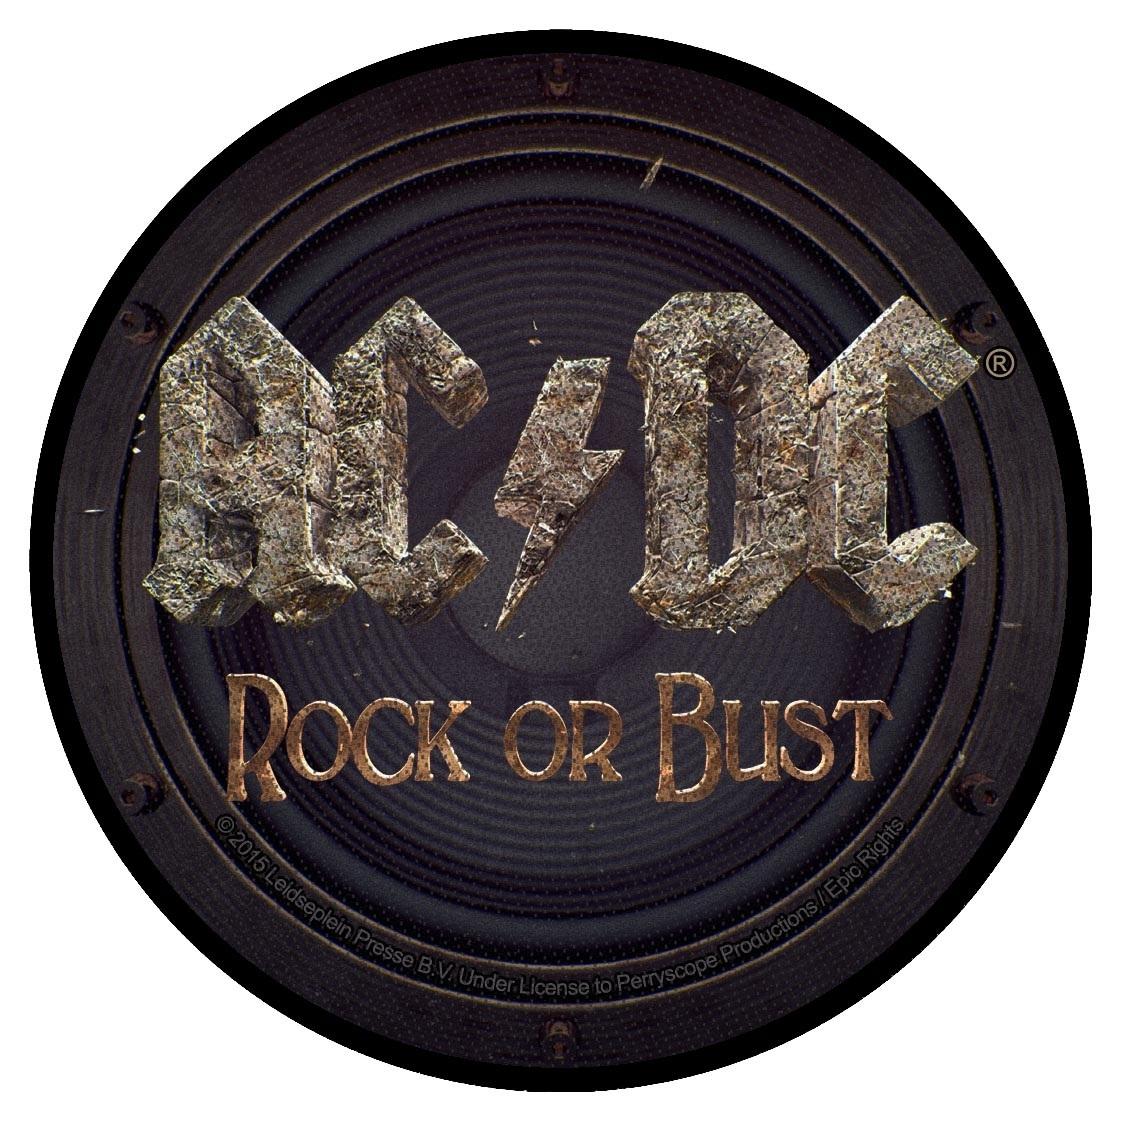 ac dc rock or bust patch. Black Bedroom Furniture Sets. Home Design Ideas